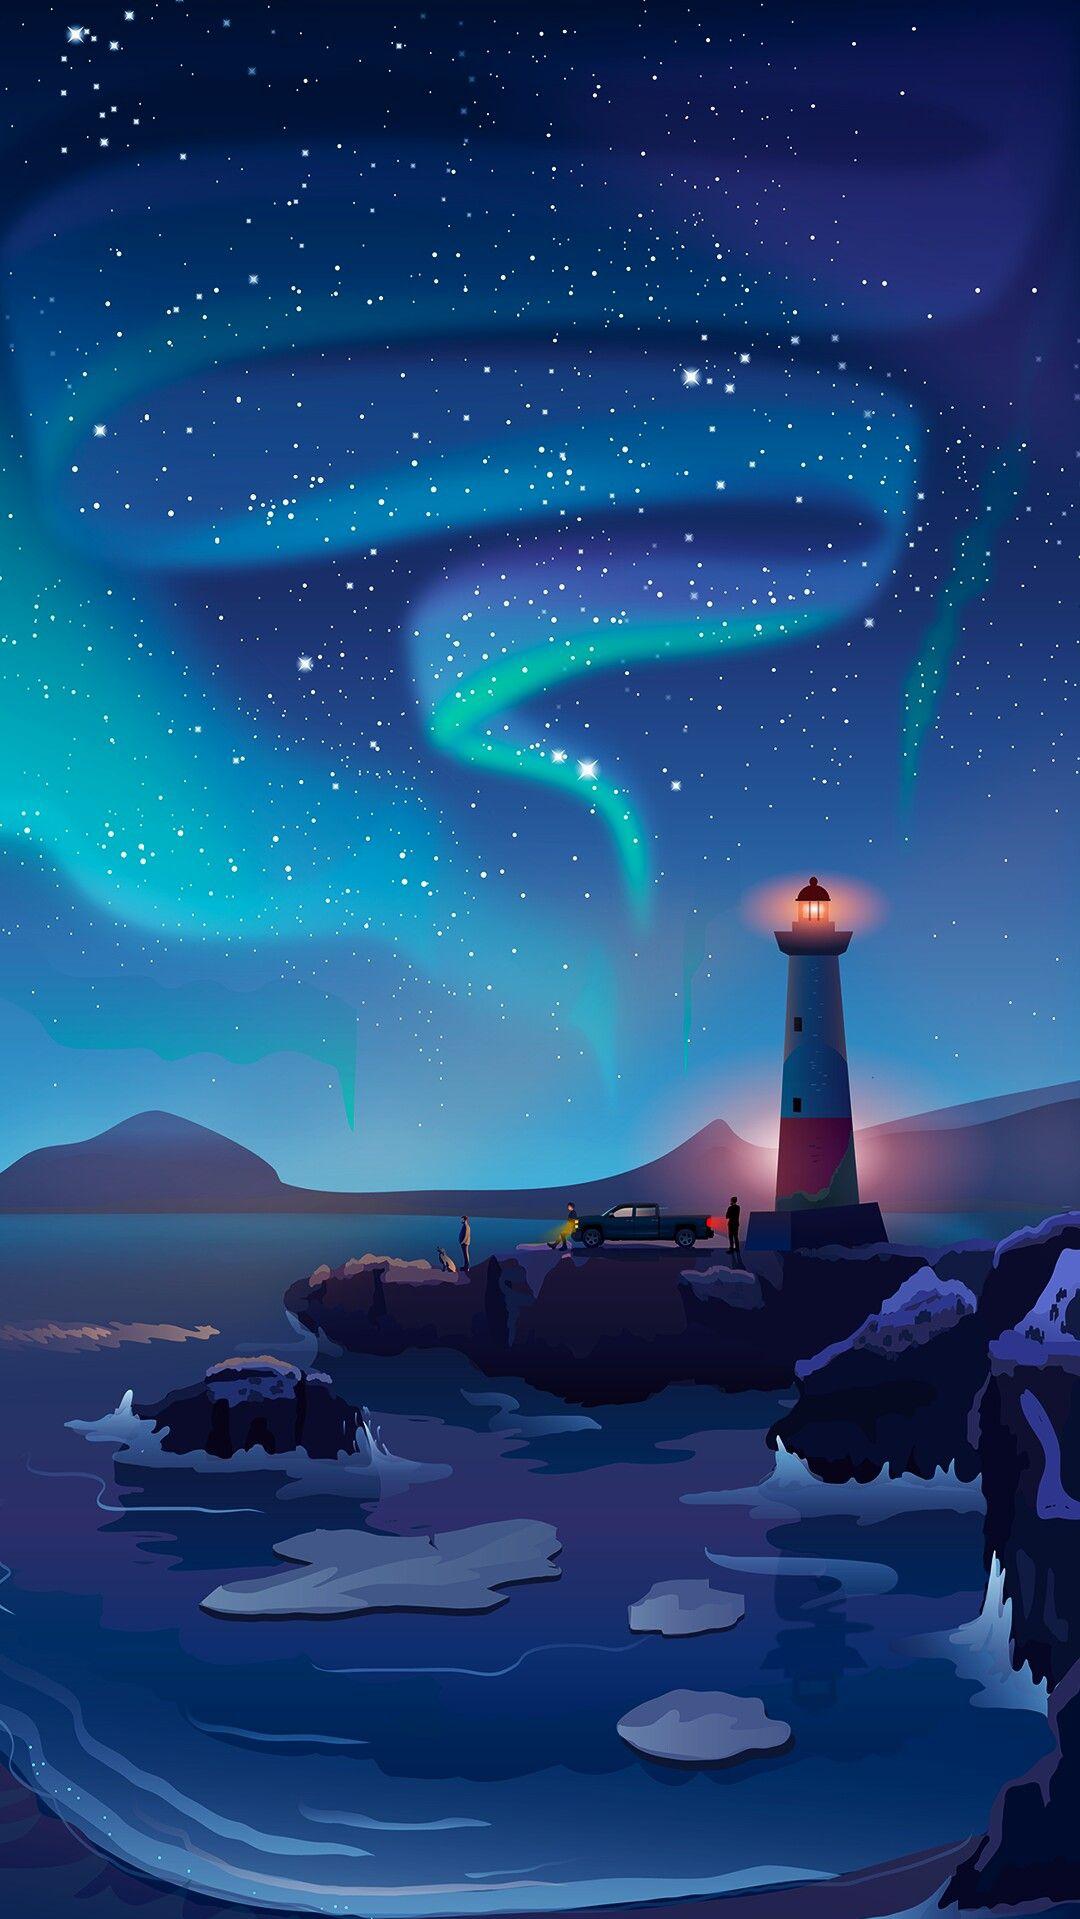 Animal Planet Wallpaper Light House Artistic Beach Night Sky Iphone Wallpaper